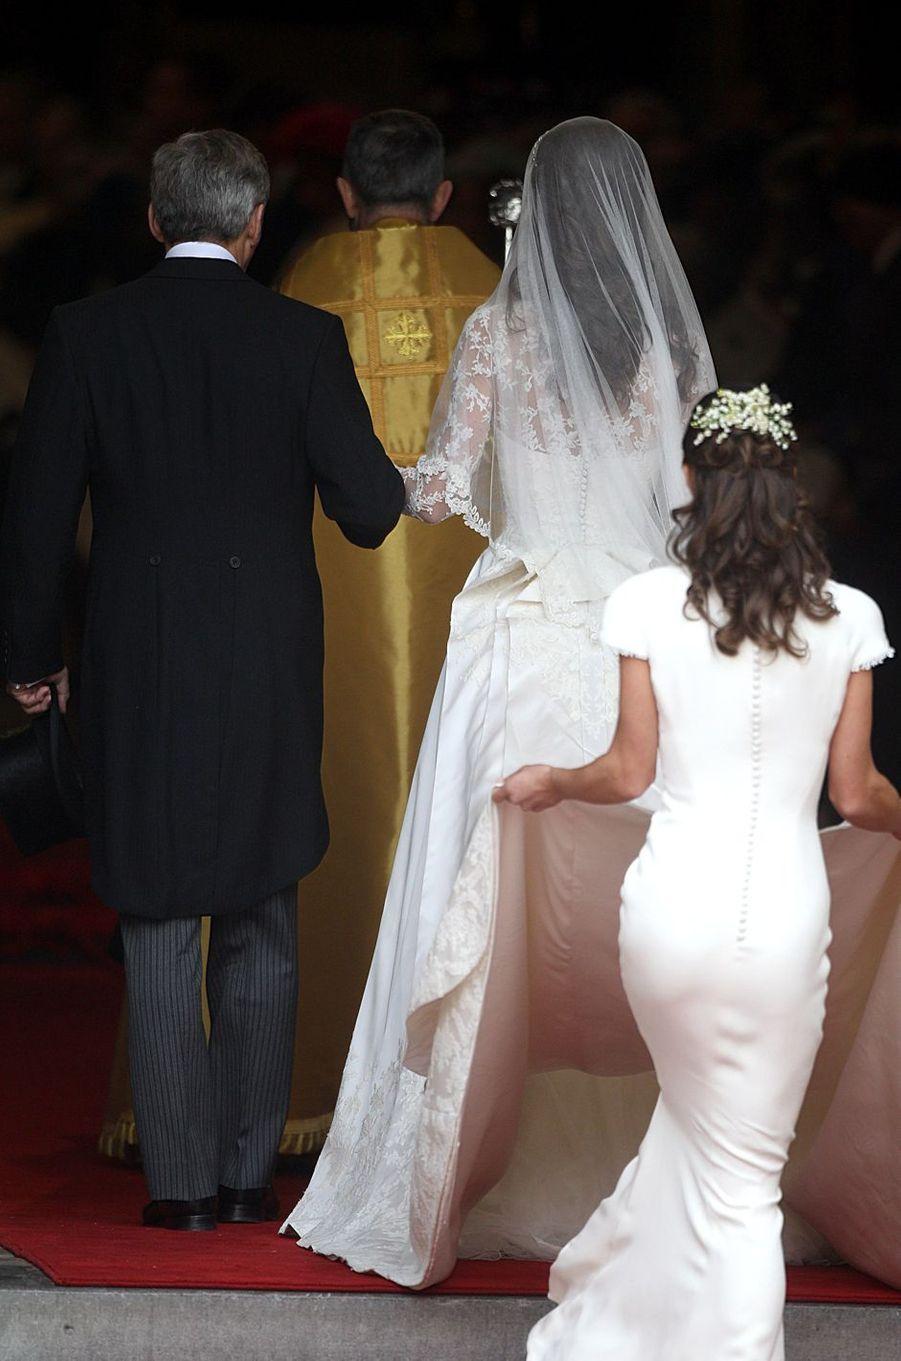 Kate et Pippa Middleton le 29 avril 2011